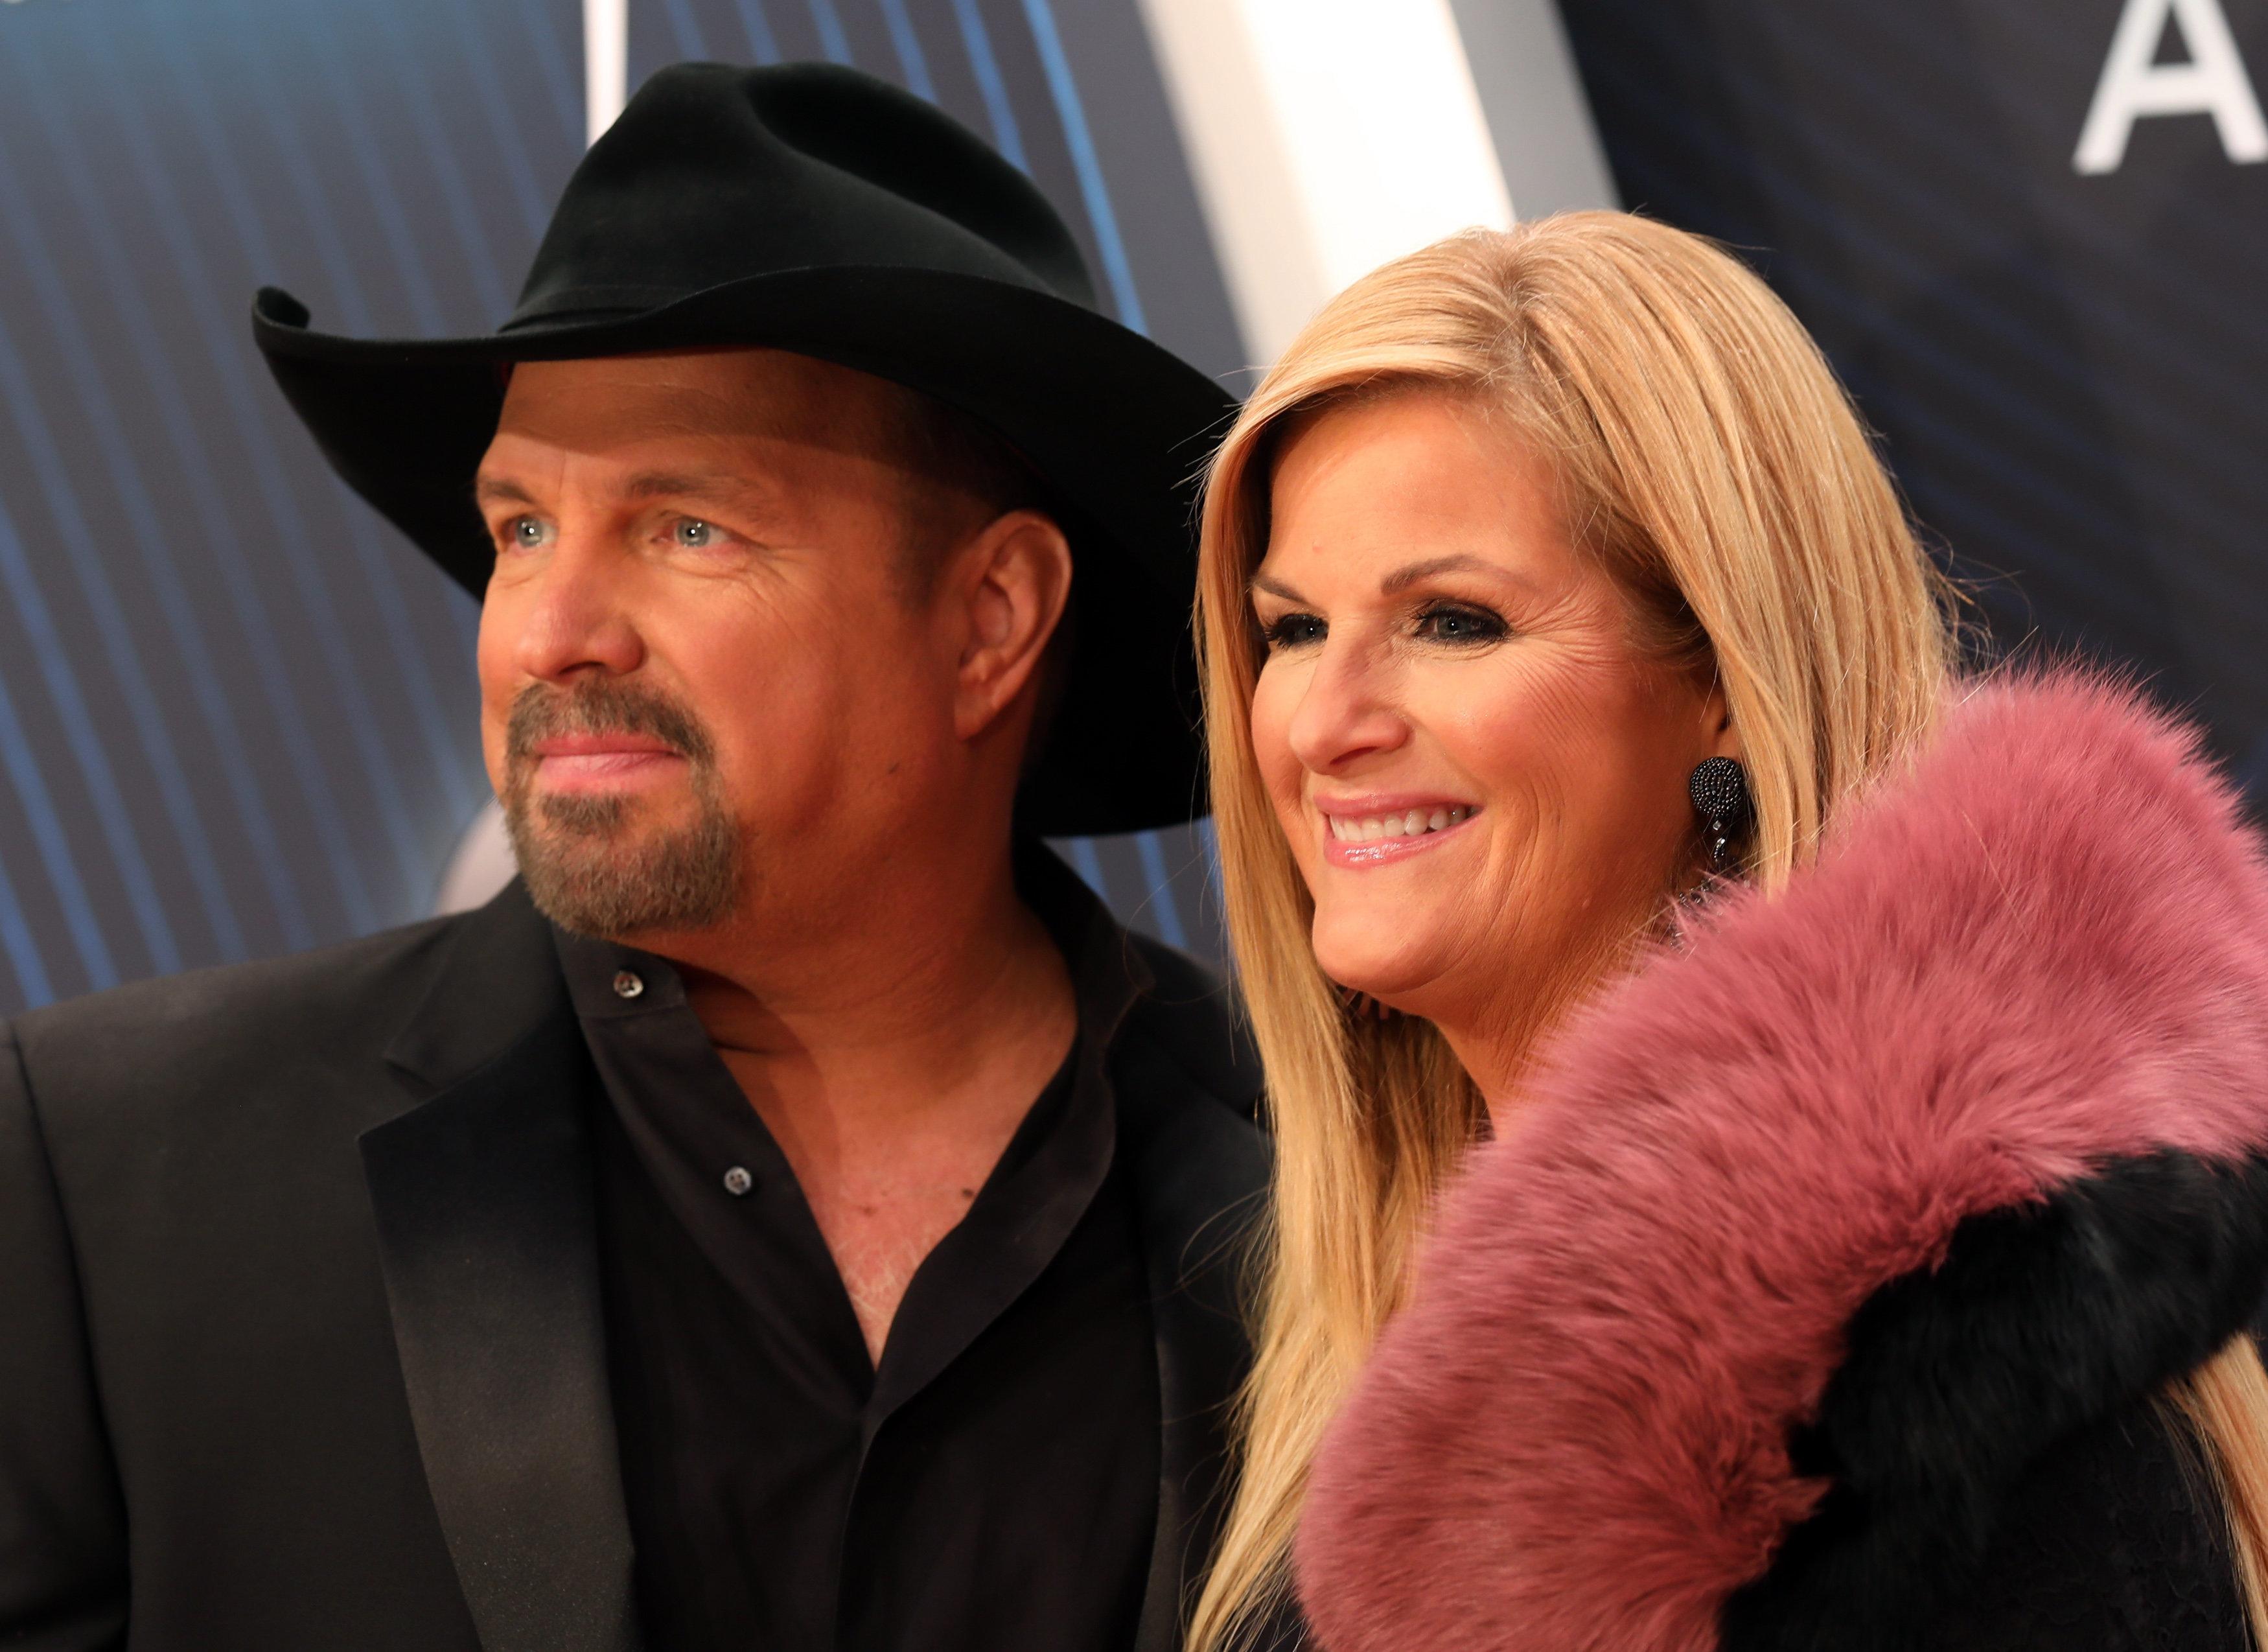 Country Music Association Awards - Arrivals - Nashville, Tennessee, U.S., 14/11/2018 - Garth Brooks and Trisha Yearwood. REUTERS/Jamie Gilliam